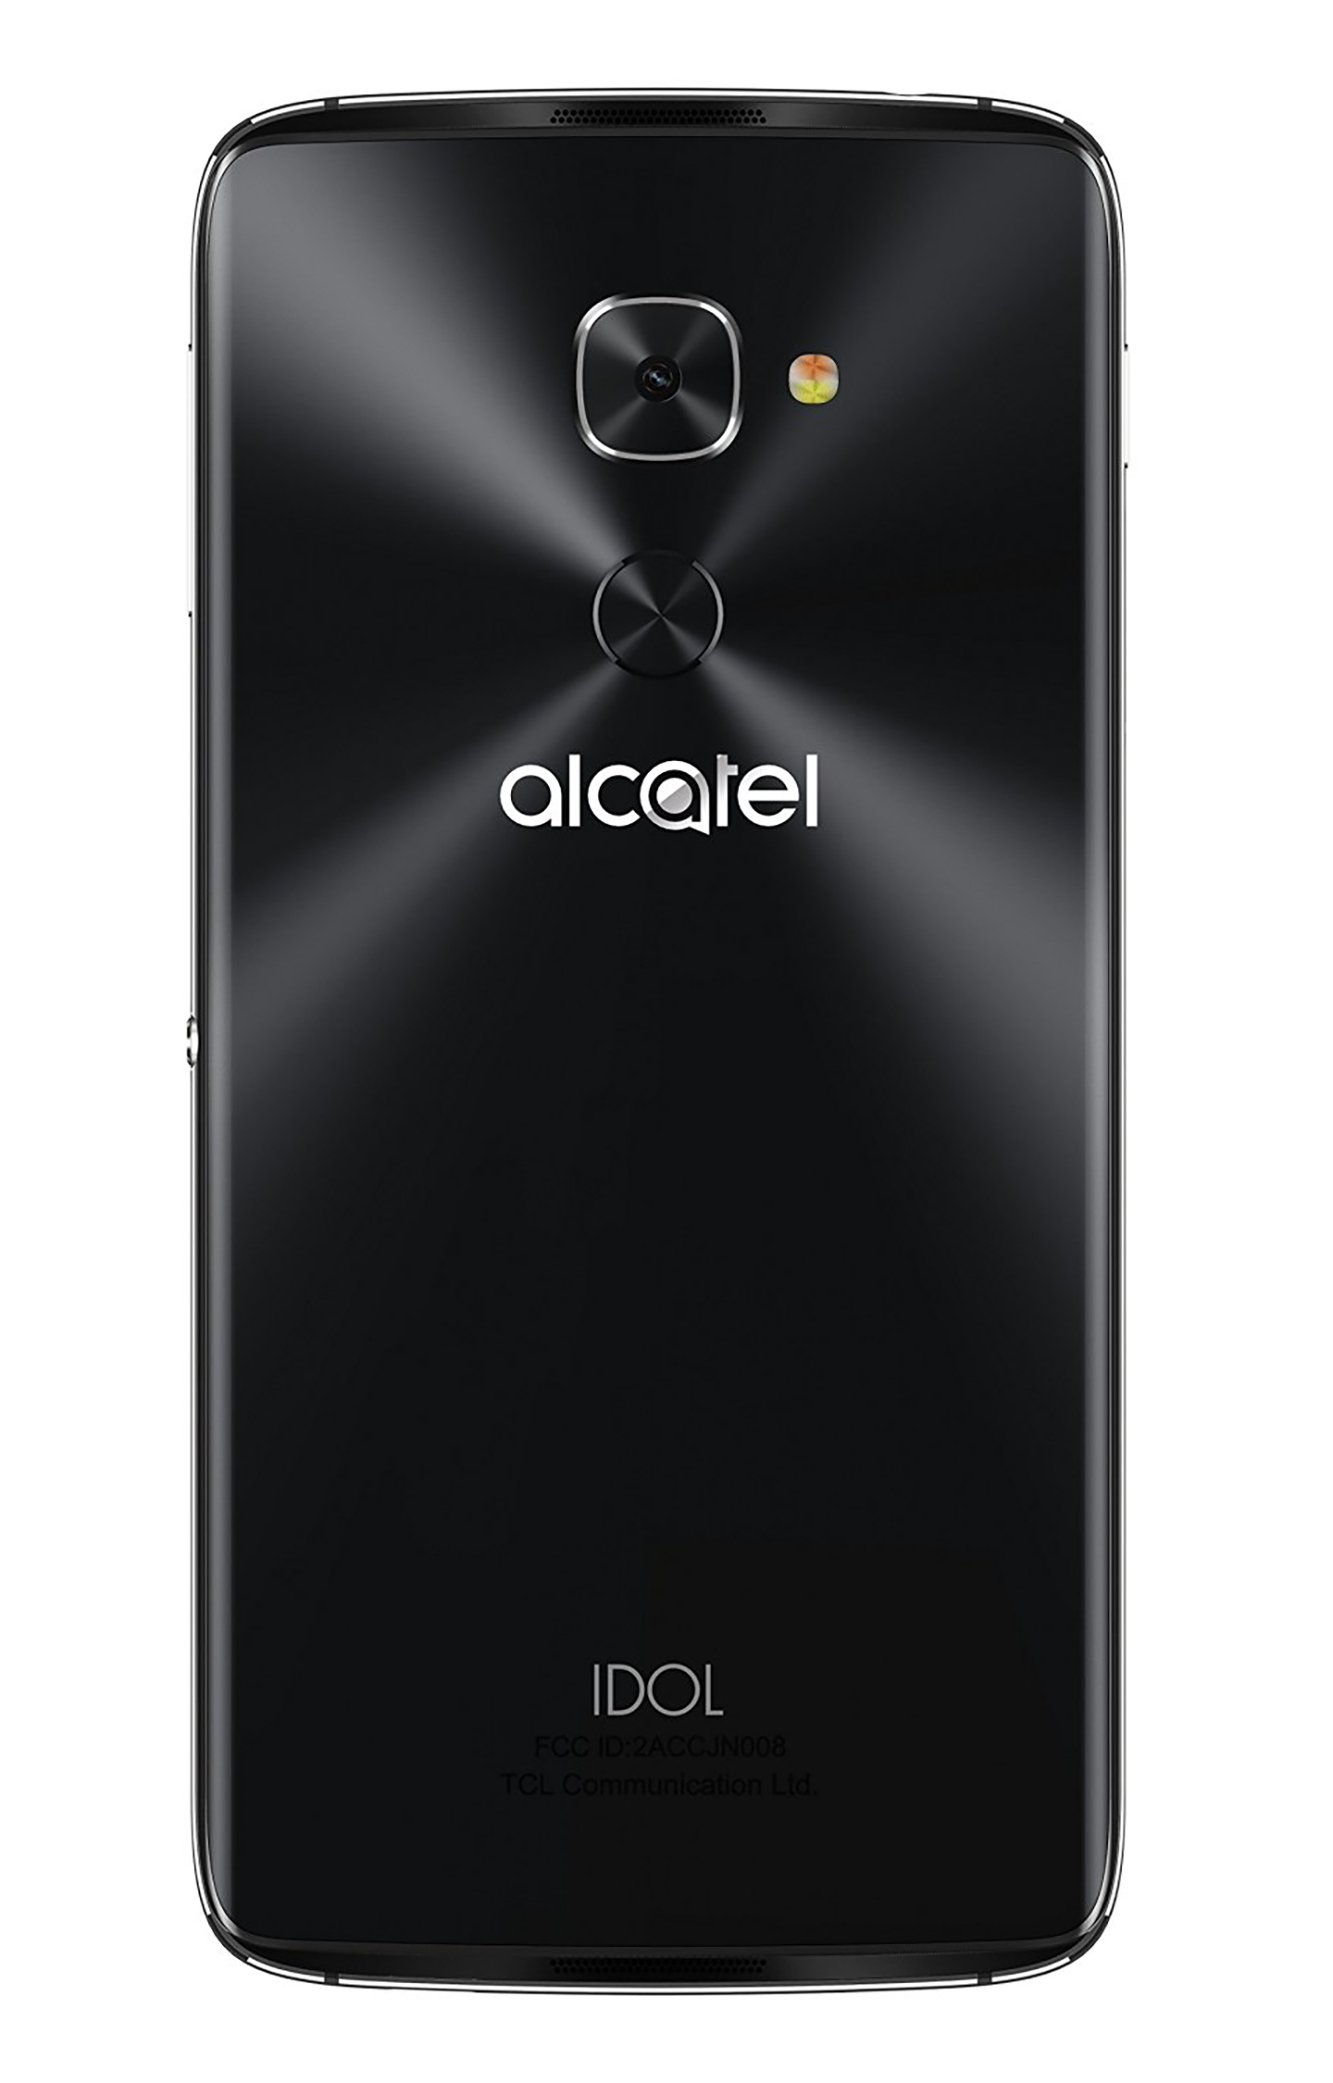 alcatel idol 4s 32gb unlocked gsm 4g lte octa core 16mp smartphone dark gray ebay. Black Bedroom Furniture Sets. Home Design Ideas